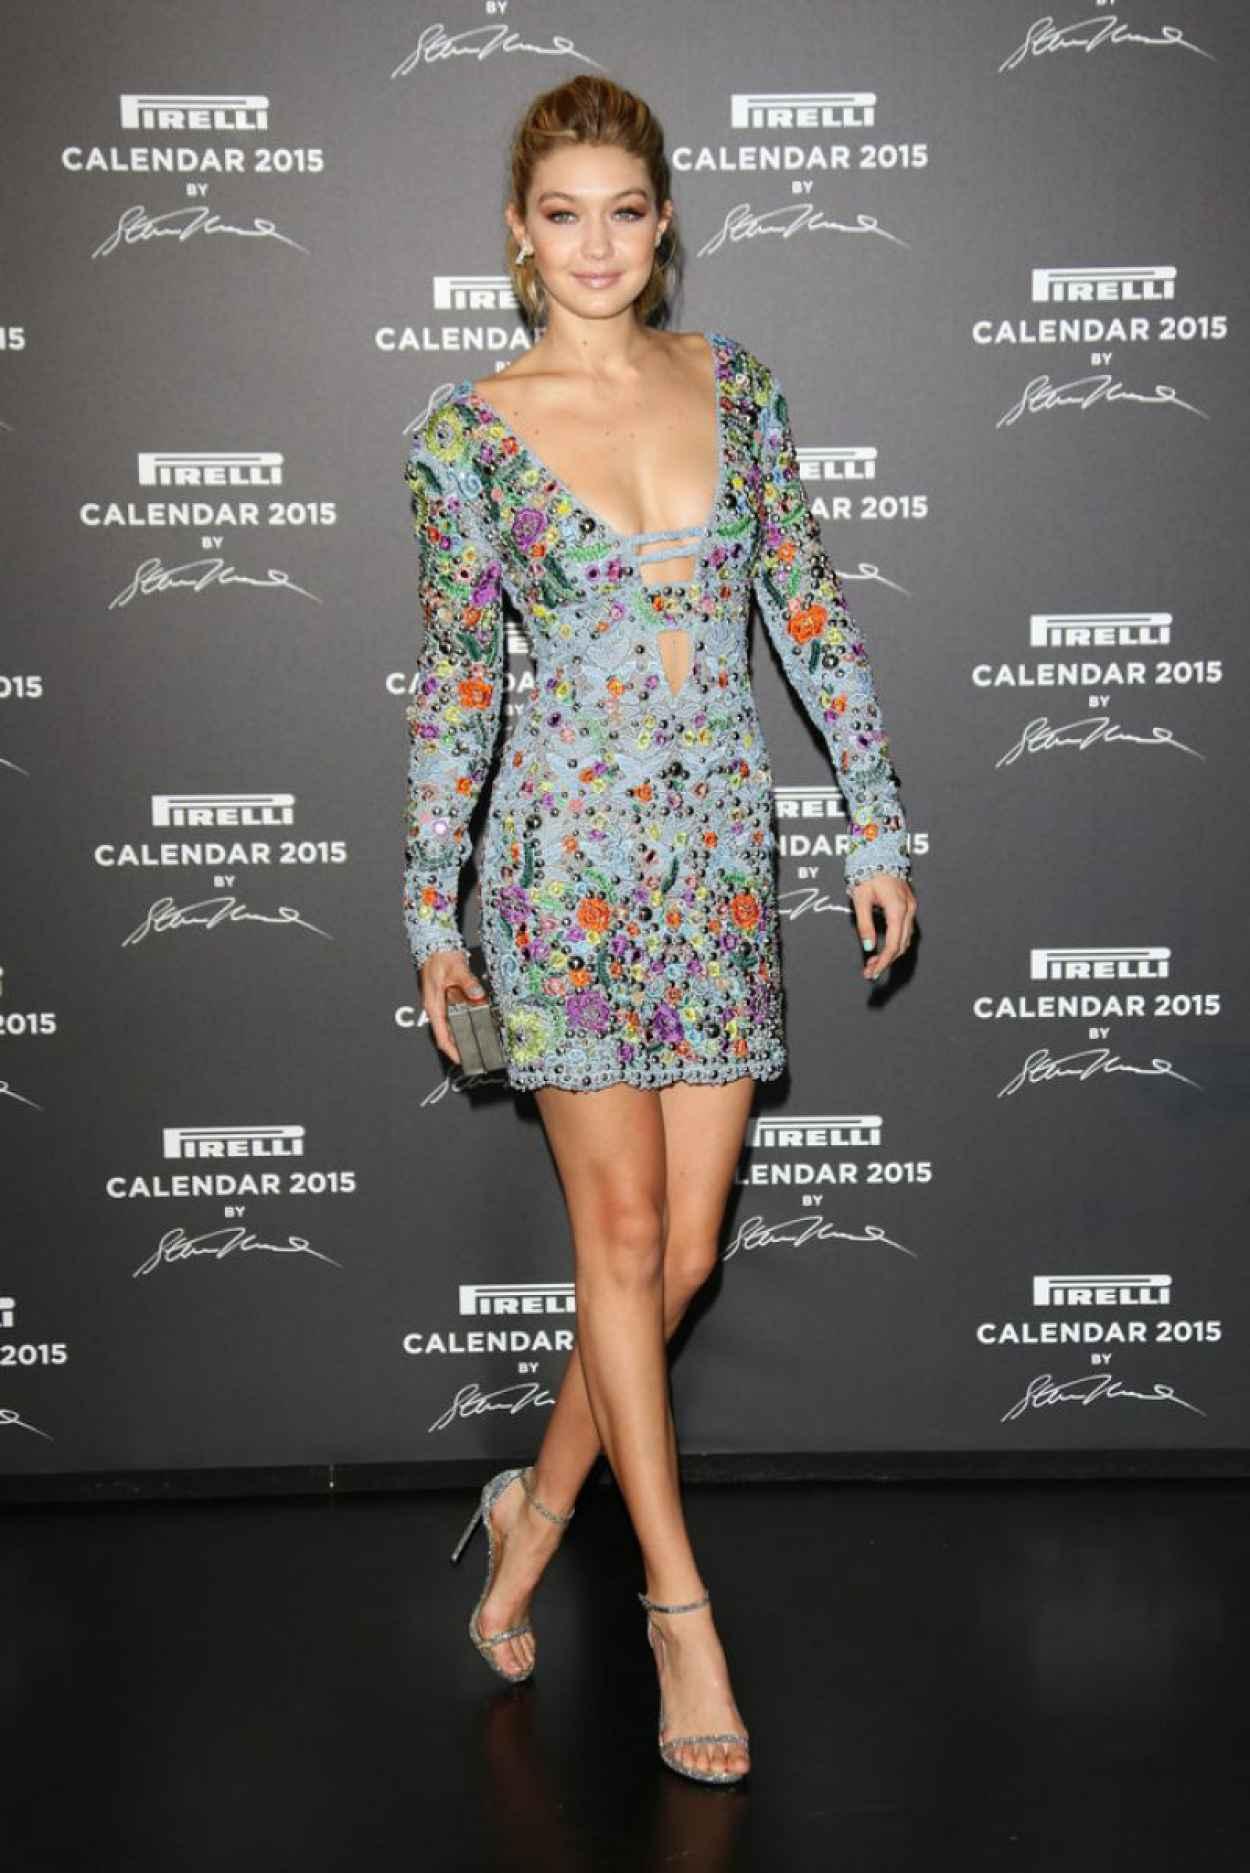 Gigi Hadid - Pirelli Calendar 2015 Event in Milan (Italy)-1